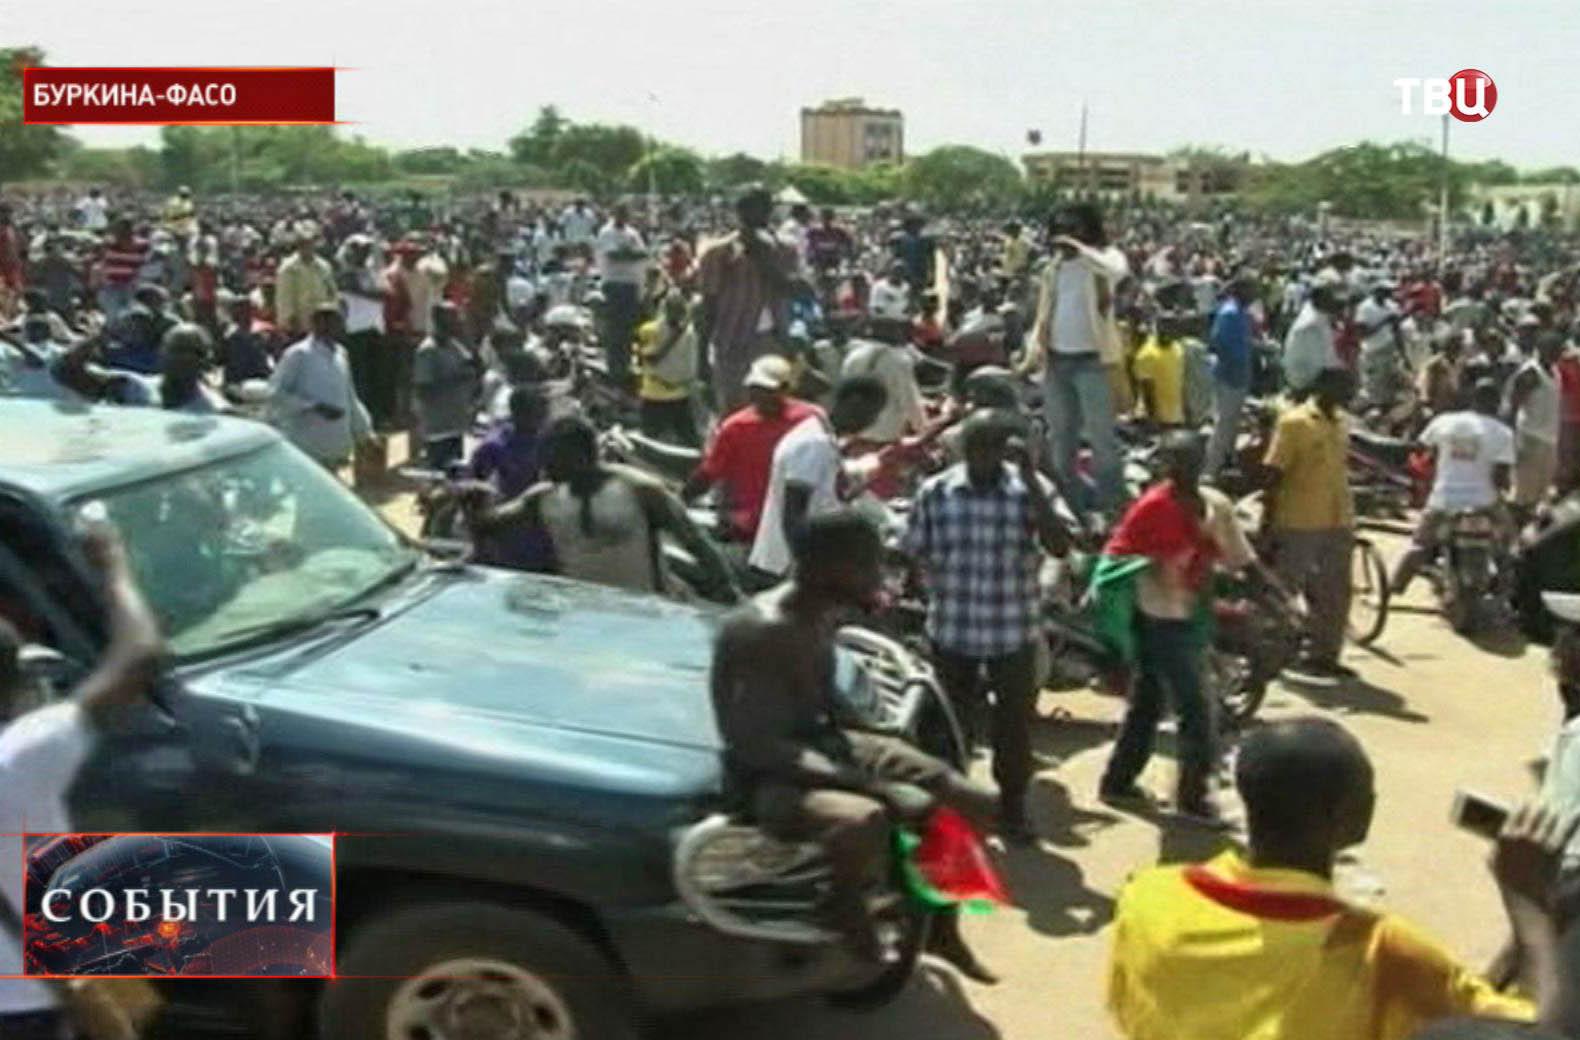 Митинг в Буркина - Фасо